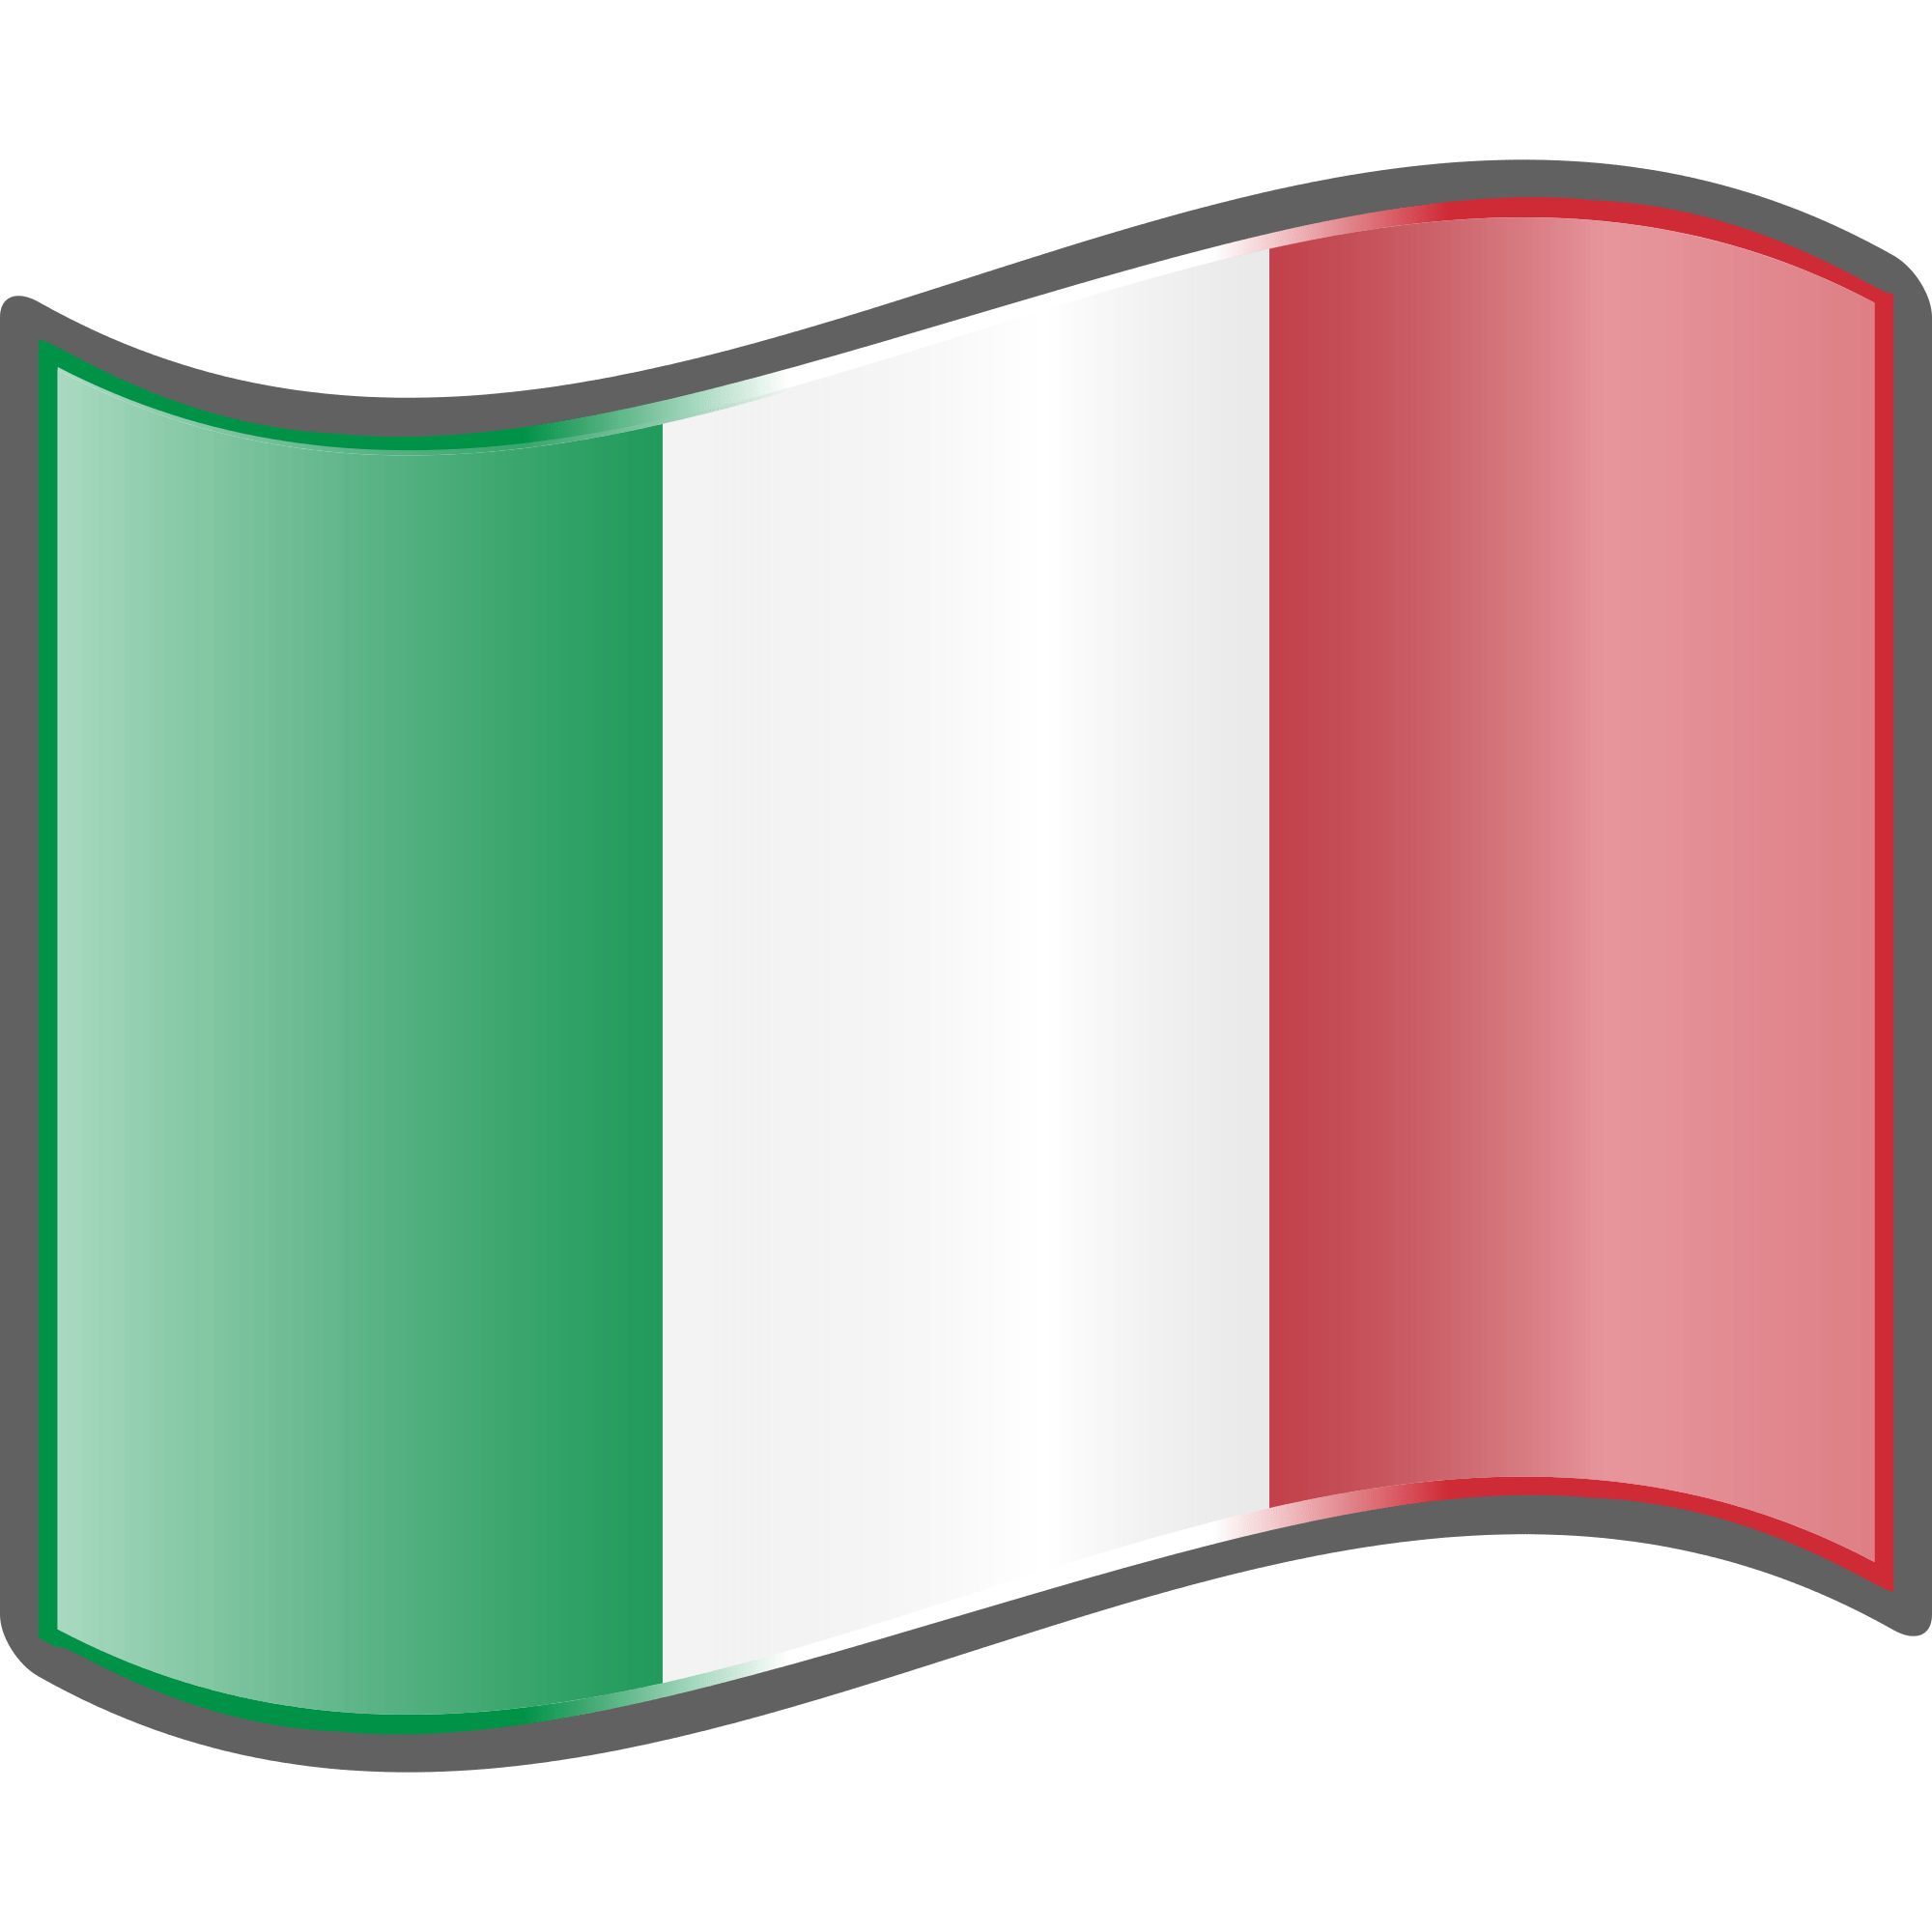 Irish clipart flag. Italian wave transparent png